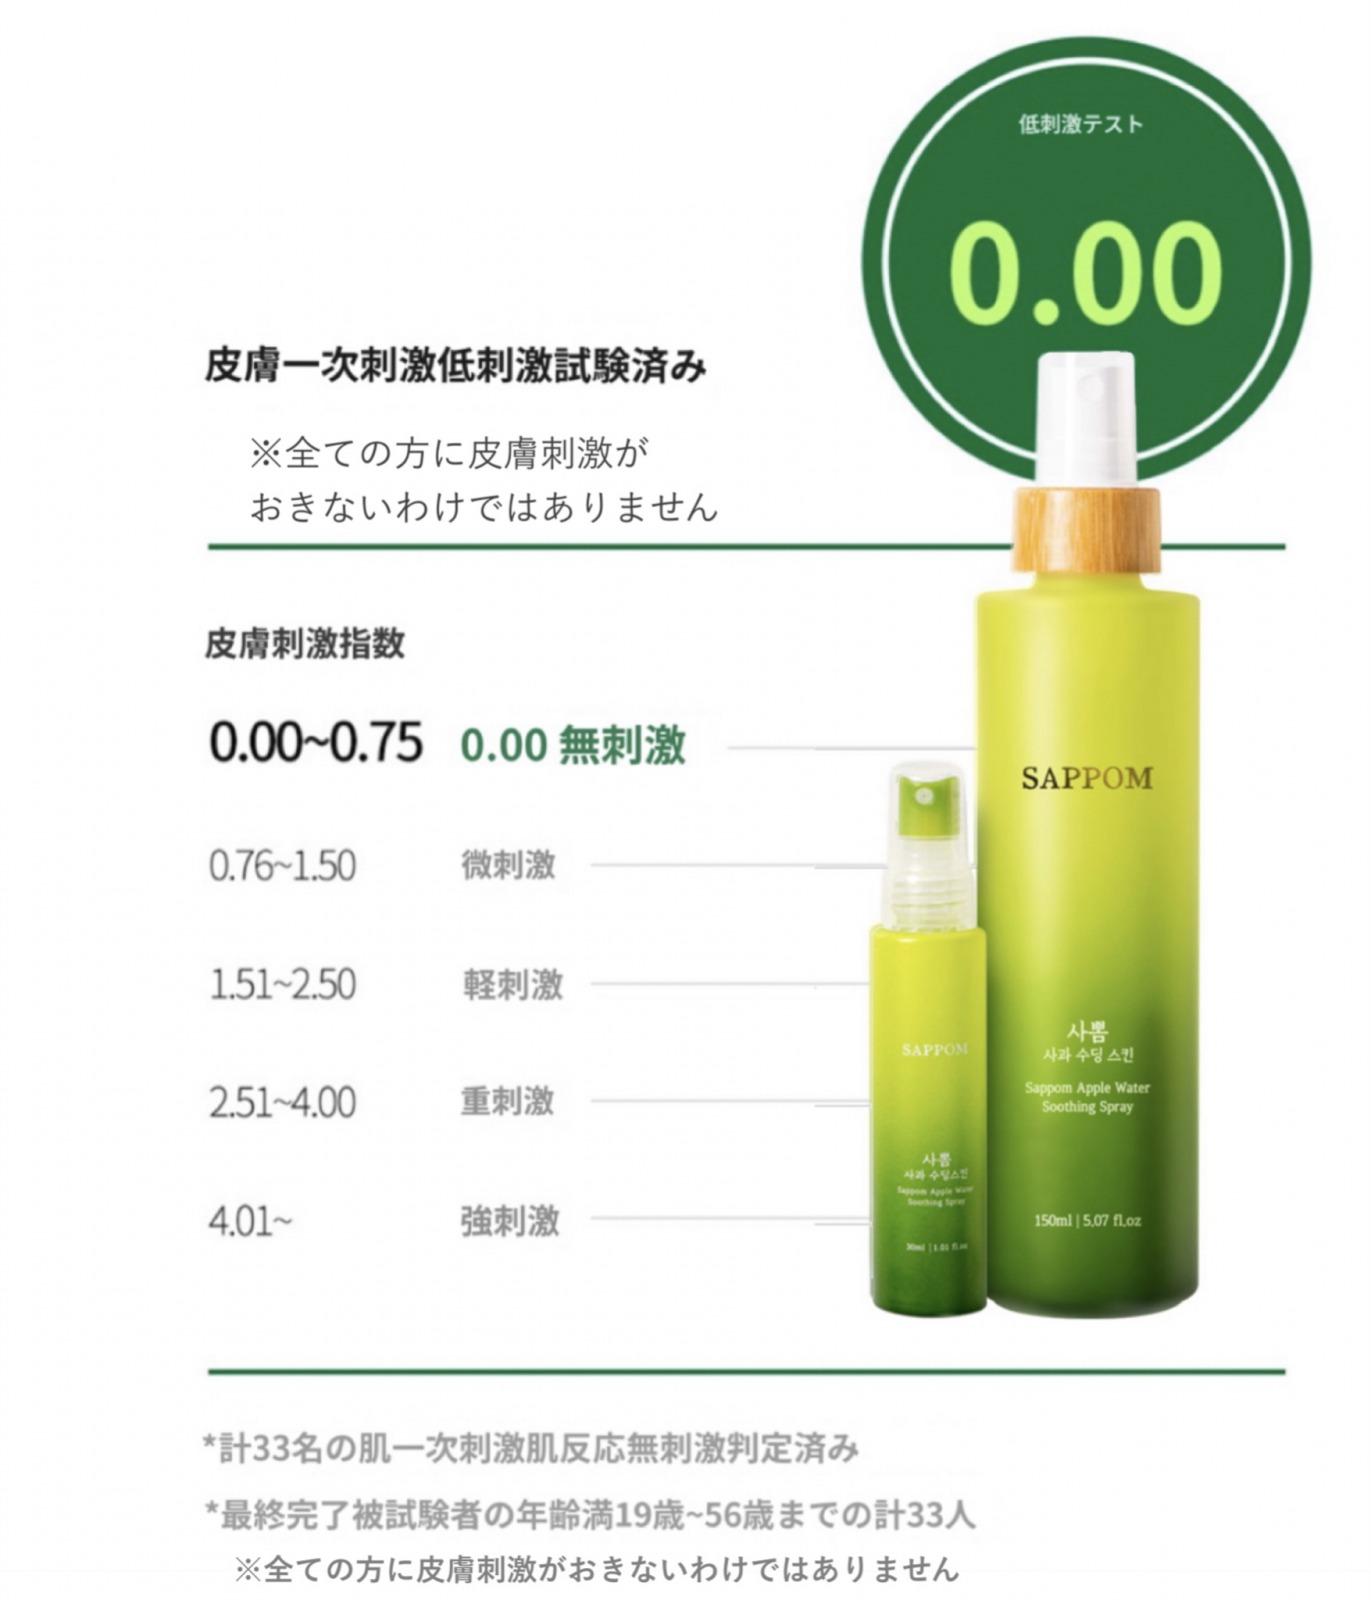 SAPPOM 安らぎ蒸留化粧水 150ml